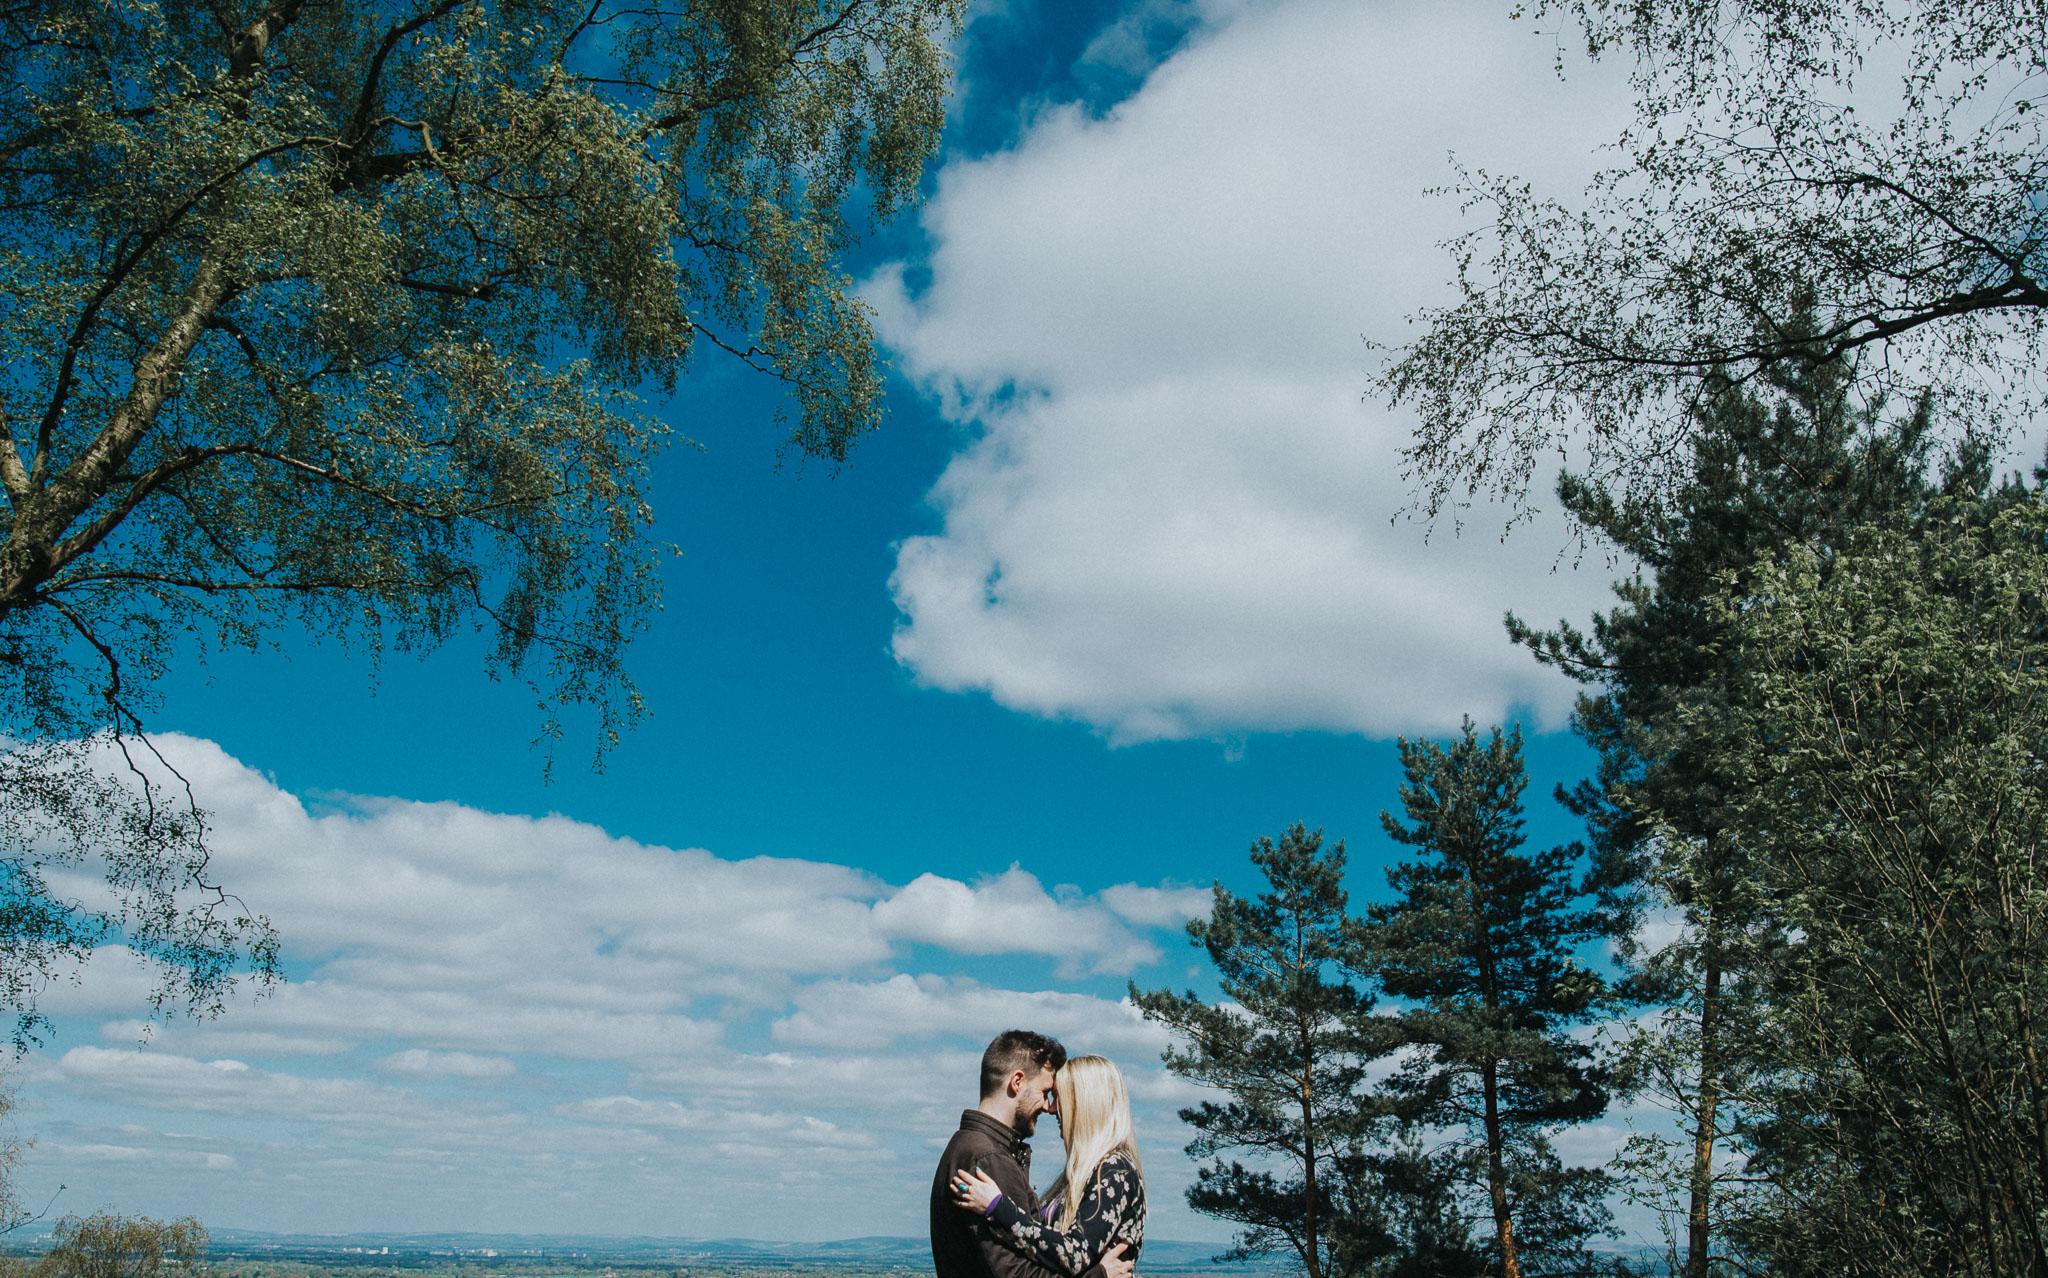 cheshire wedding photographer documents quirky engagement photo for boho chic wedding